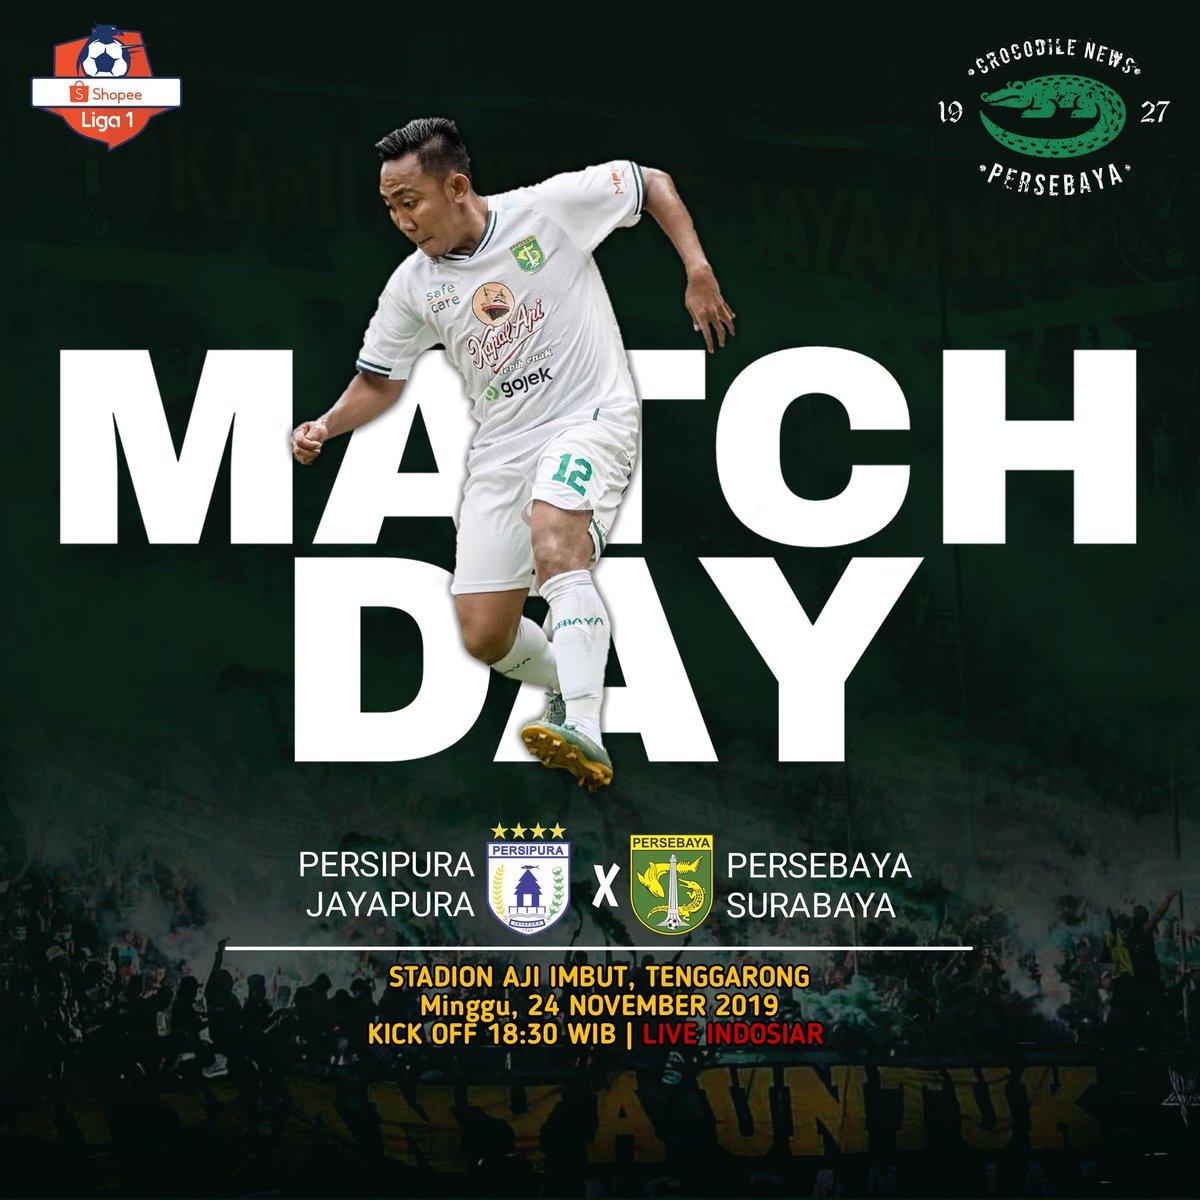 MATCH DAY! PEKAN 28! _ 🏆 Shopee Liga 1! 🆚 Persipura Jayapura Vs Persebaya Surabaya 📆 Minggu, 24 November 2019 ⏰ Kick Off 18.30 WIB 🏟 Stadion Aji Imbut, Tenggarong 📺 Live Indosiar  KUDU MENANG HARGA MATI!👊🔥 #Persebaya #bajolijo #greenforce #CrocodileNews #bonek #bonita